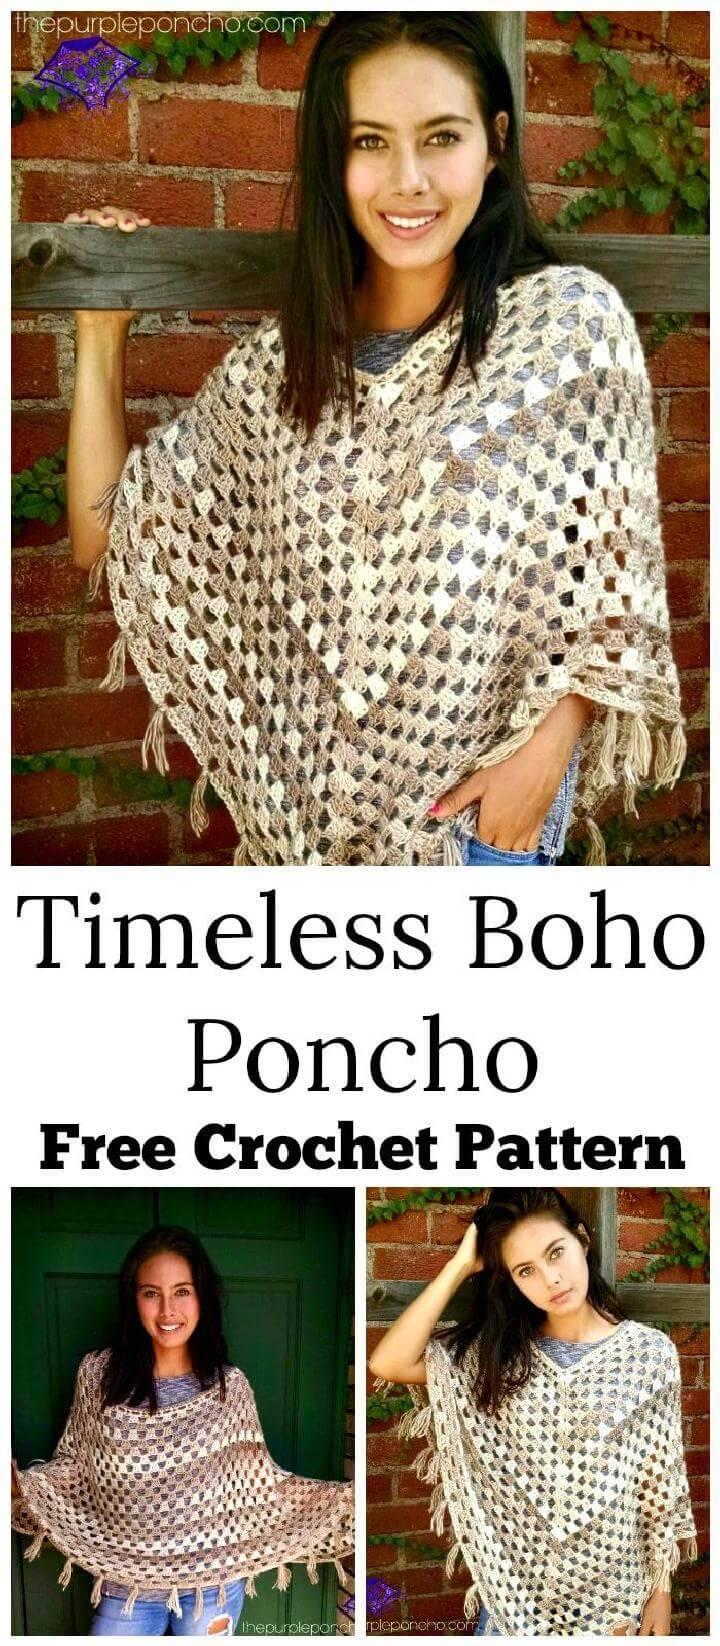 Timeless Boho Poncho – Free Crochet Pattern